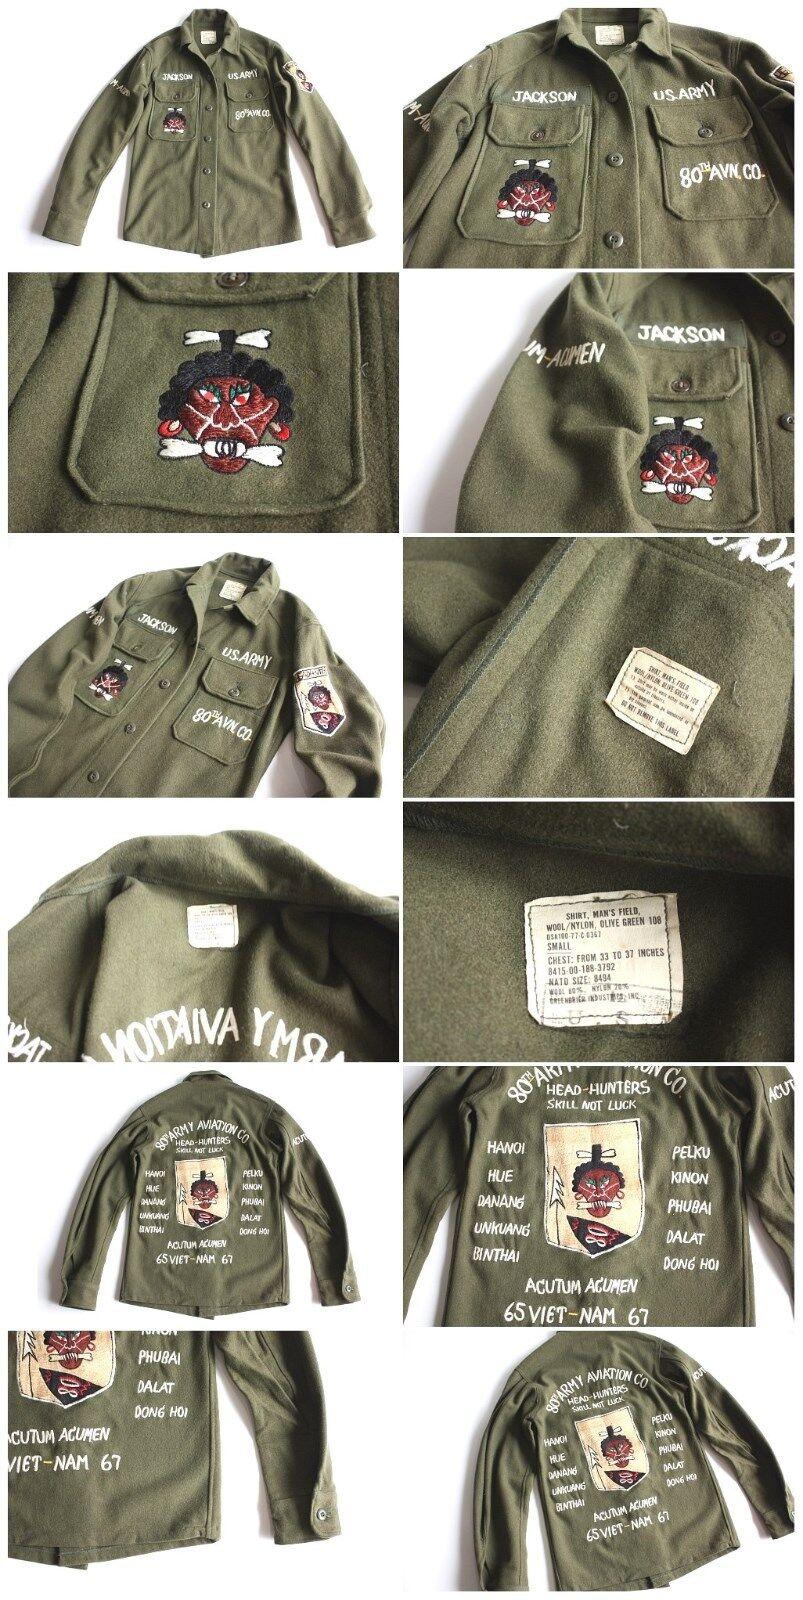 VTG OG-108 + Custom Embroidered WOOL FIELD MILITARY ARMY SHIRT SOUVENIR  JACKET